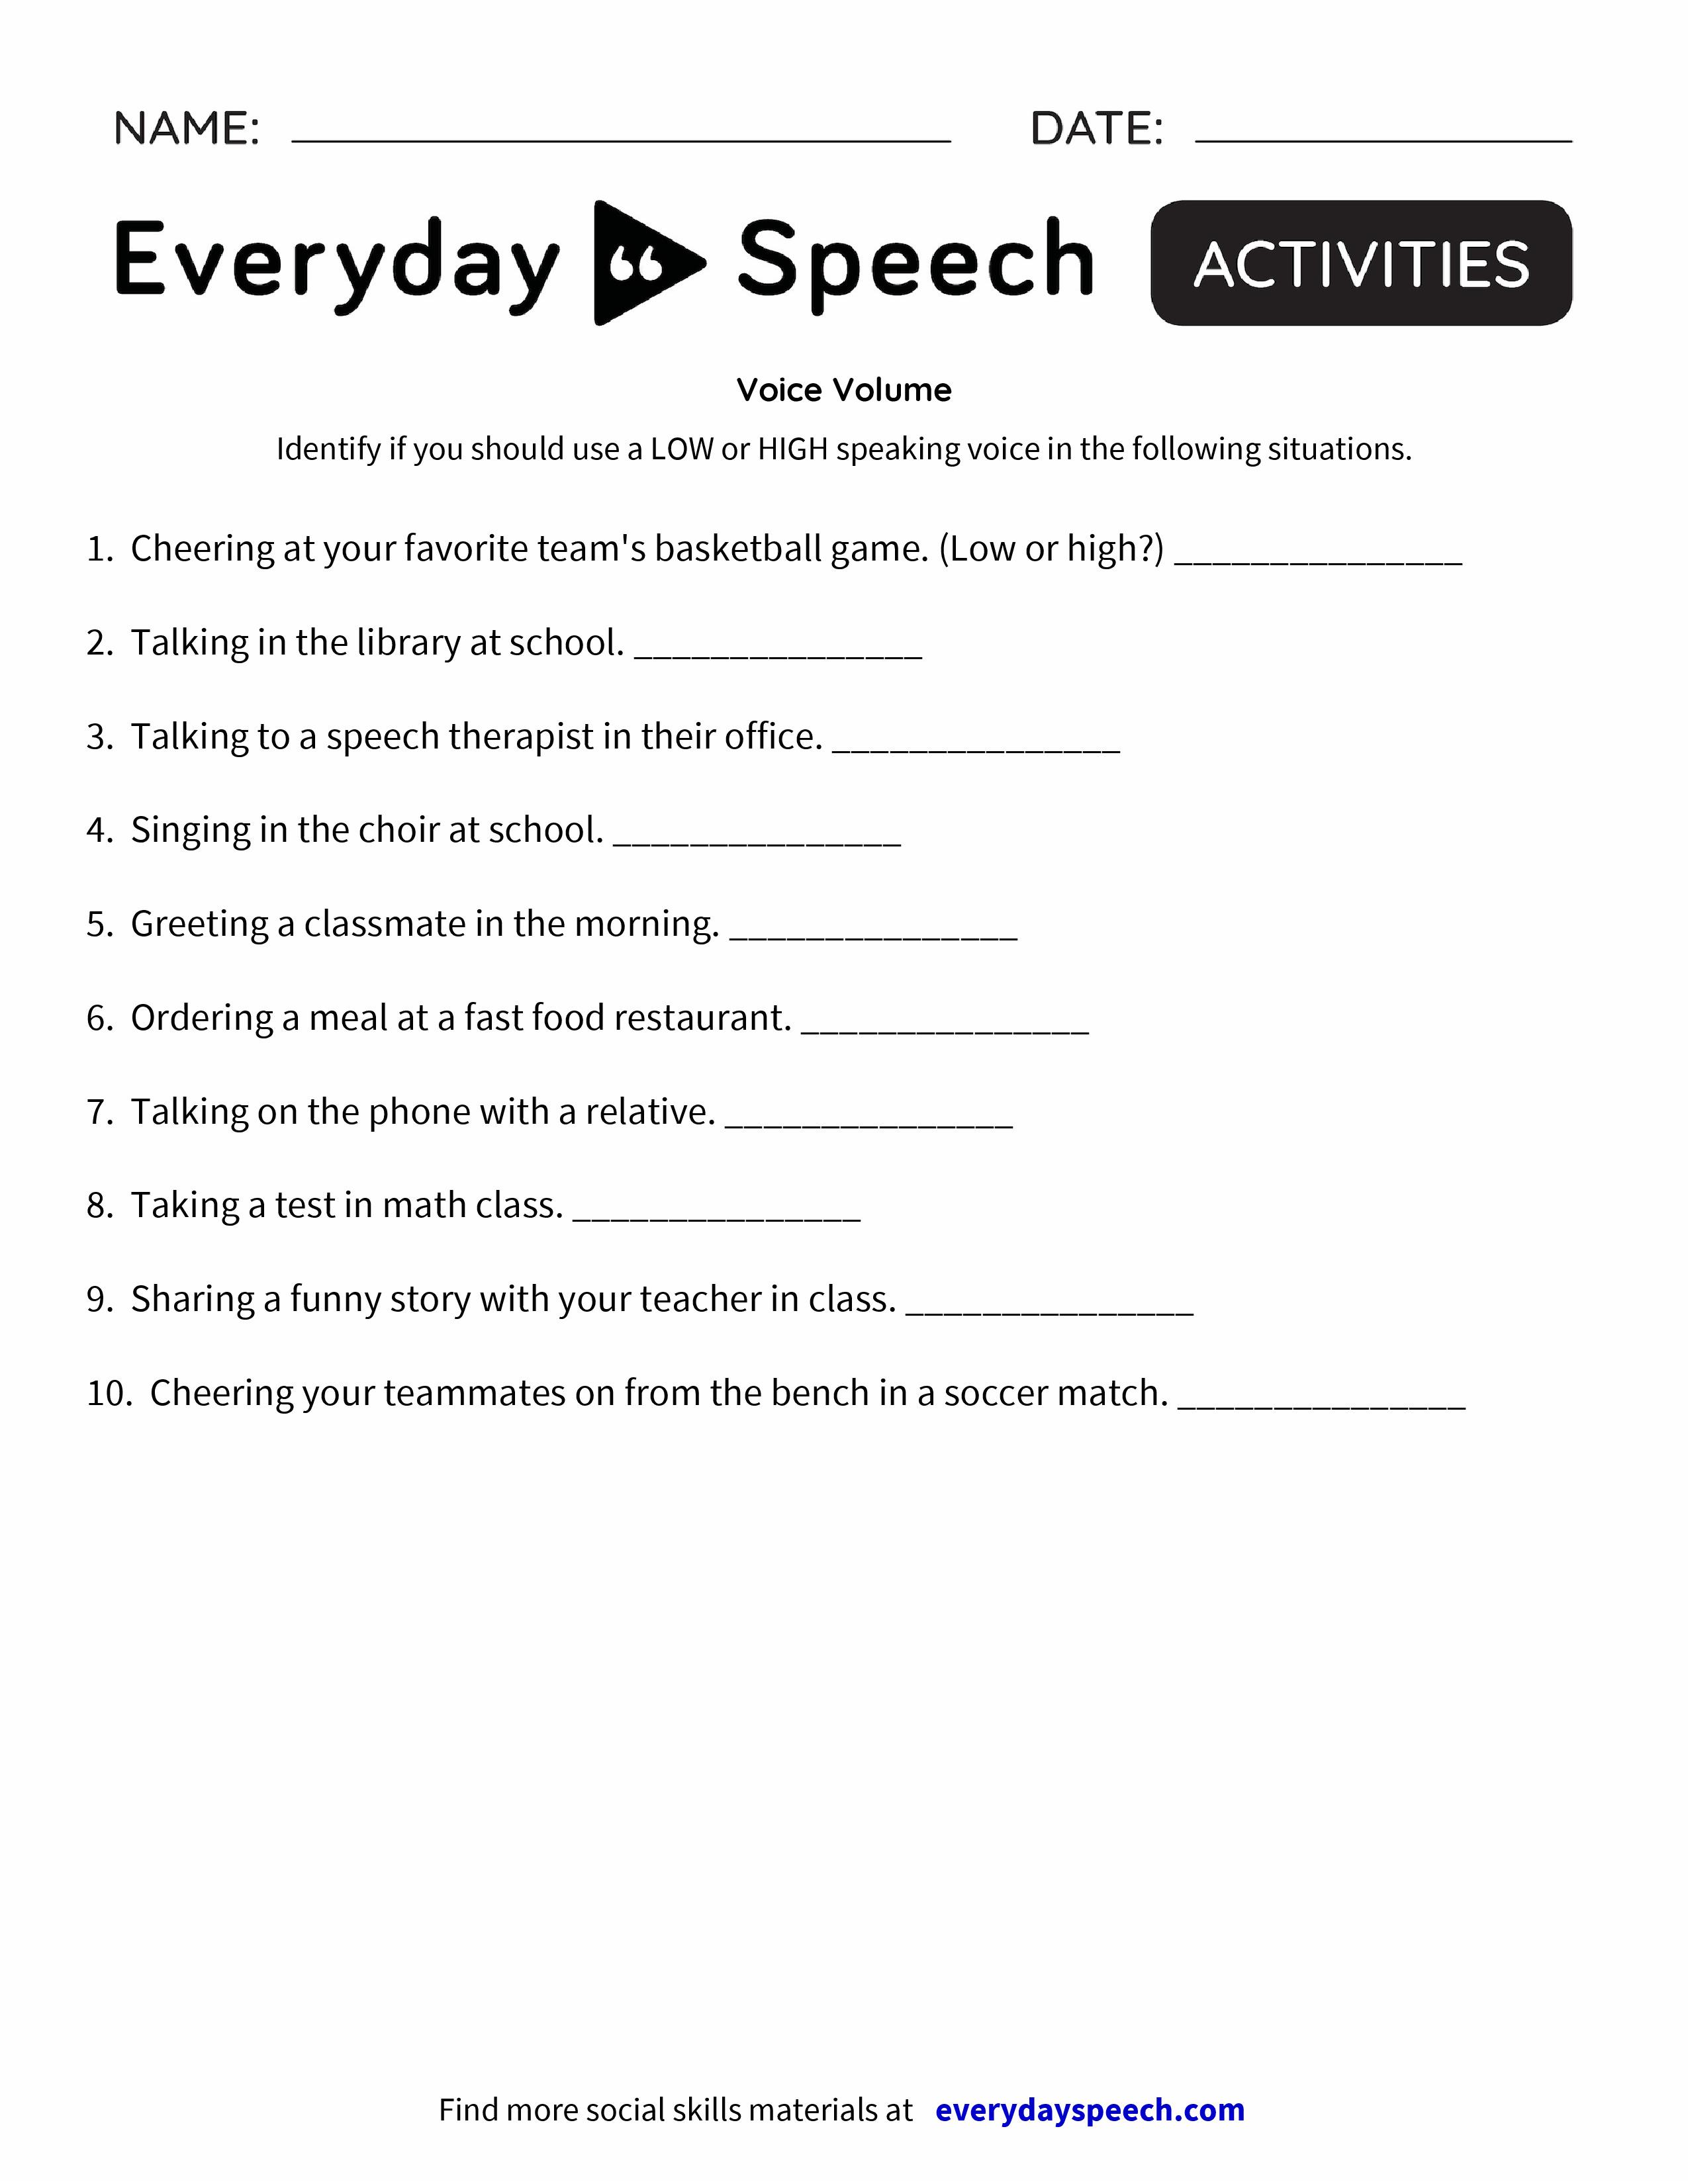 Voice Volume Everyday Speech Everyday Speech